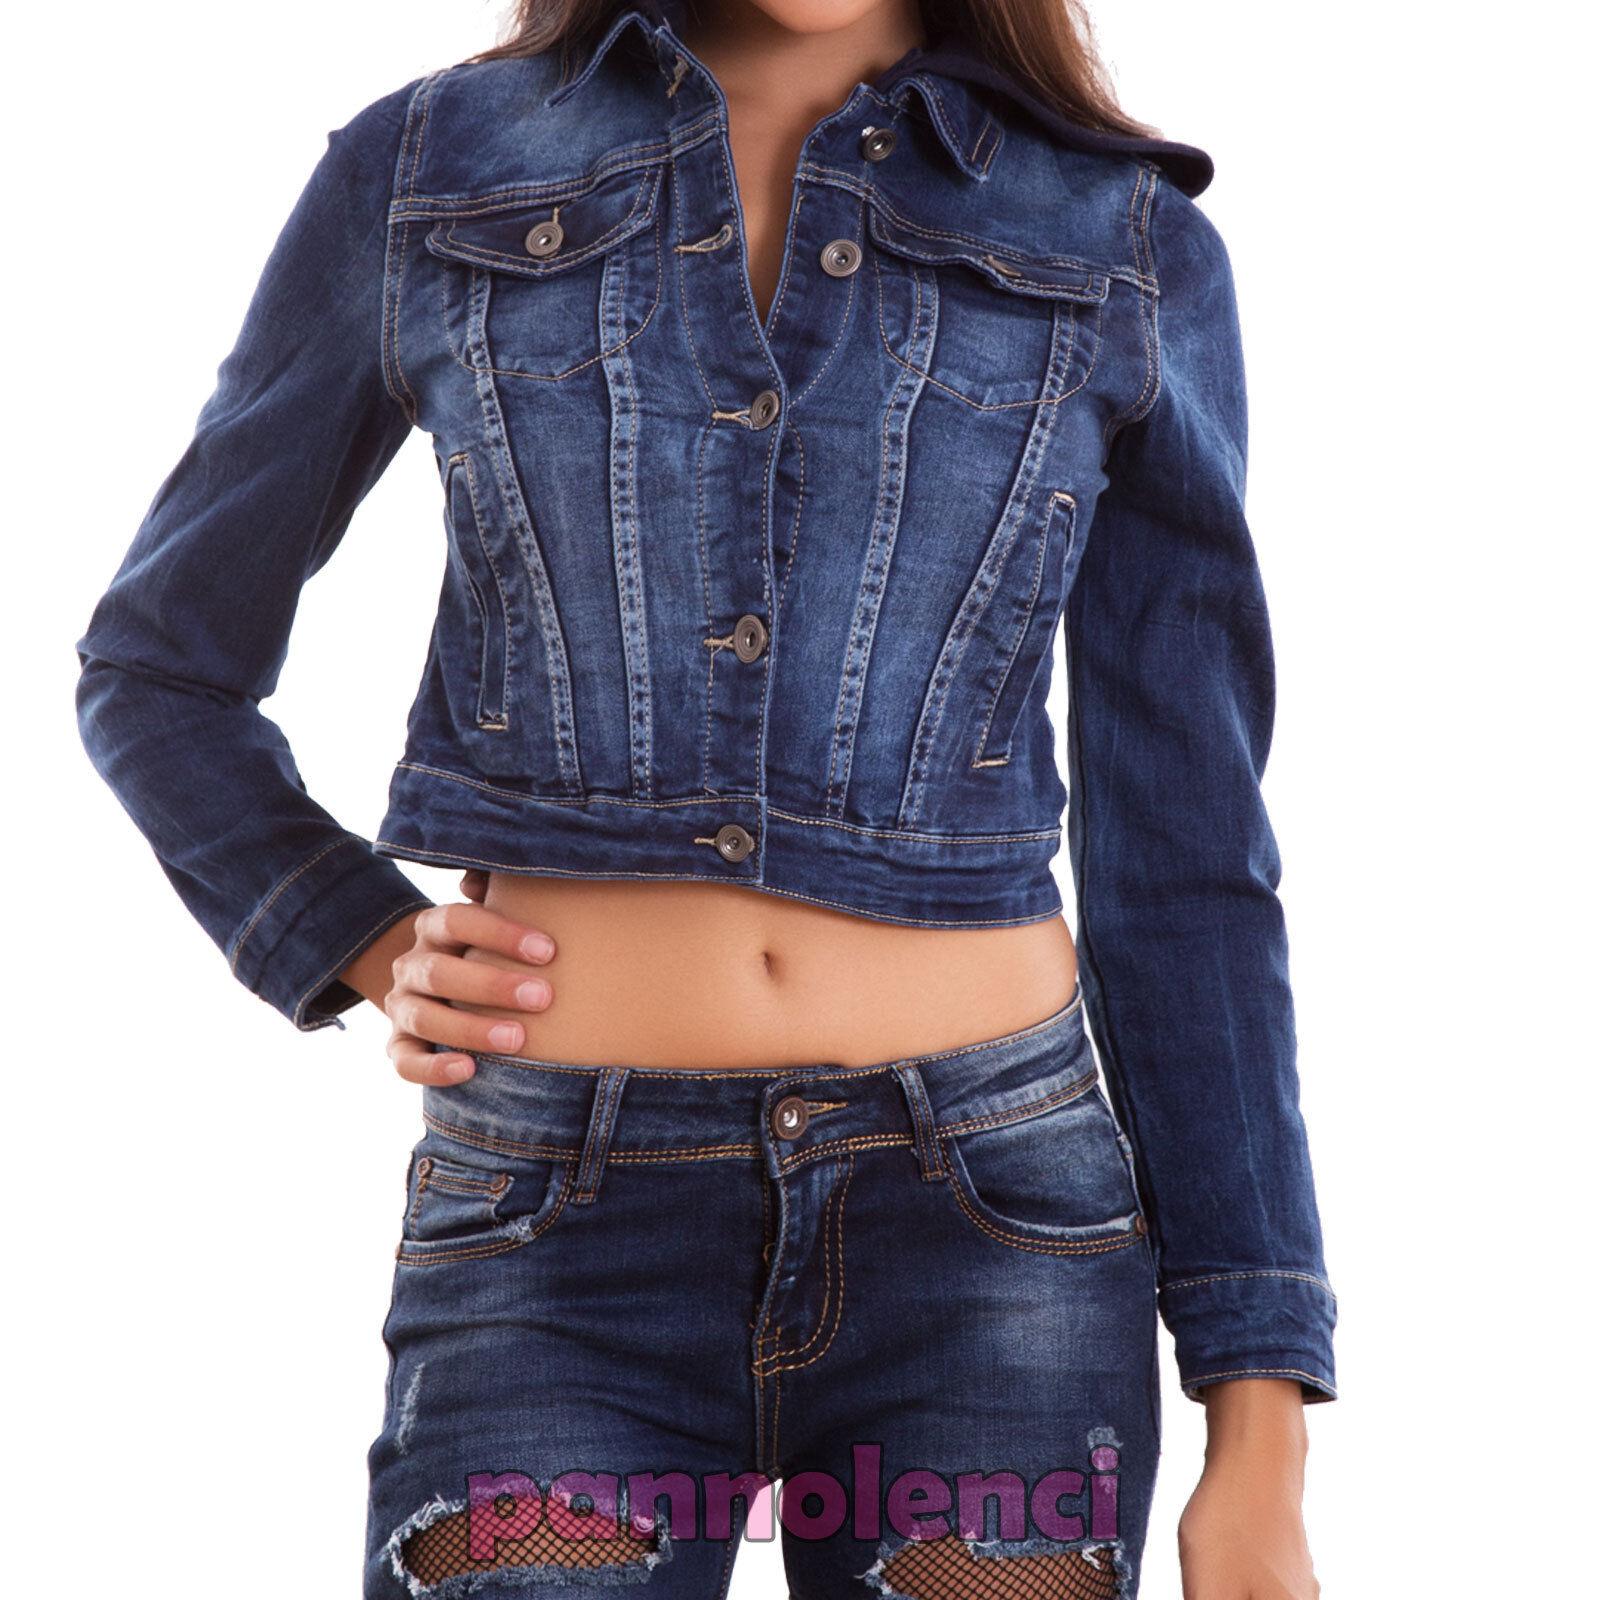 Chaqueta Chaqueta Chaqueta vaqueros de mujer capucha chaquetón chaleco collar nuevo JS8005 93074c